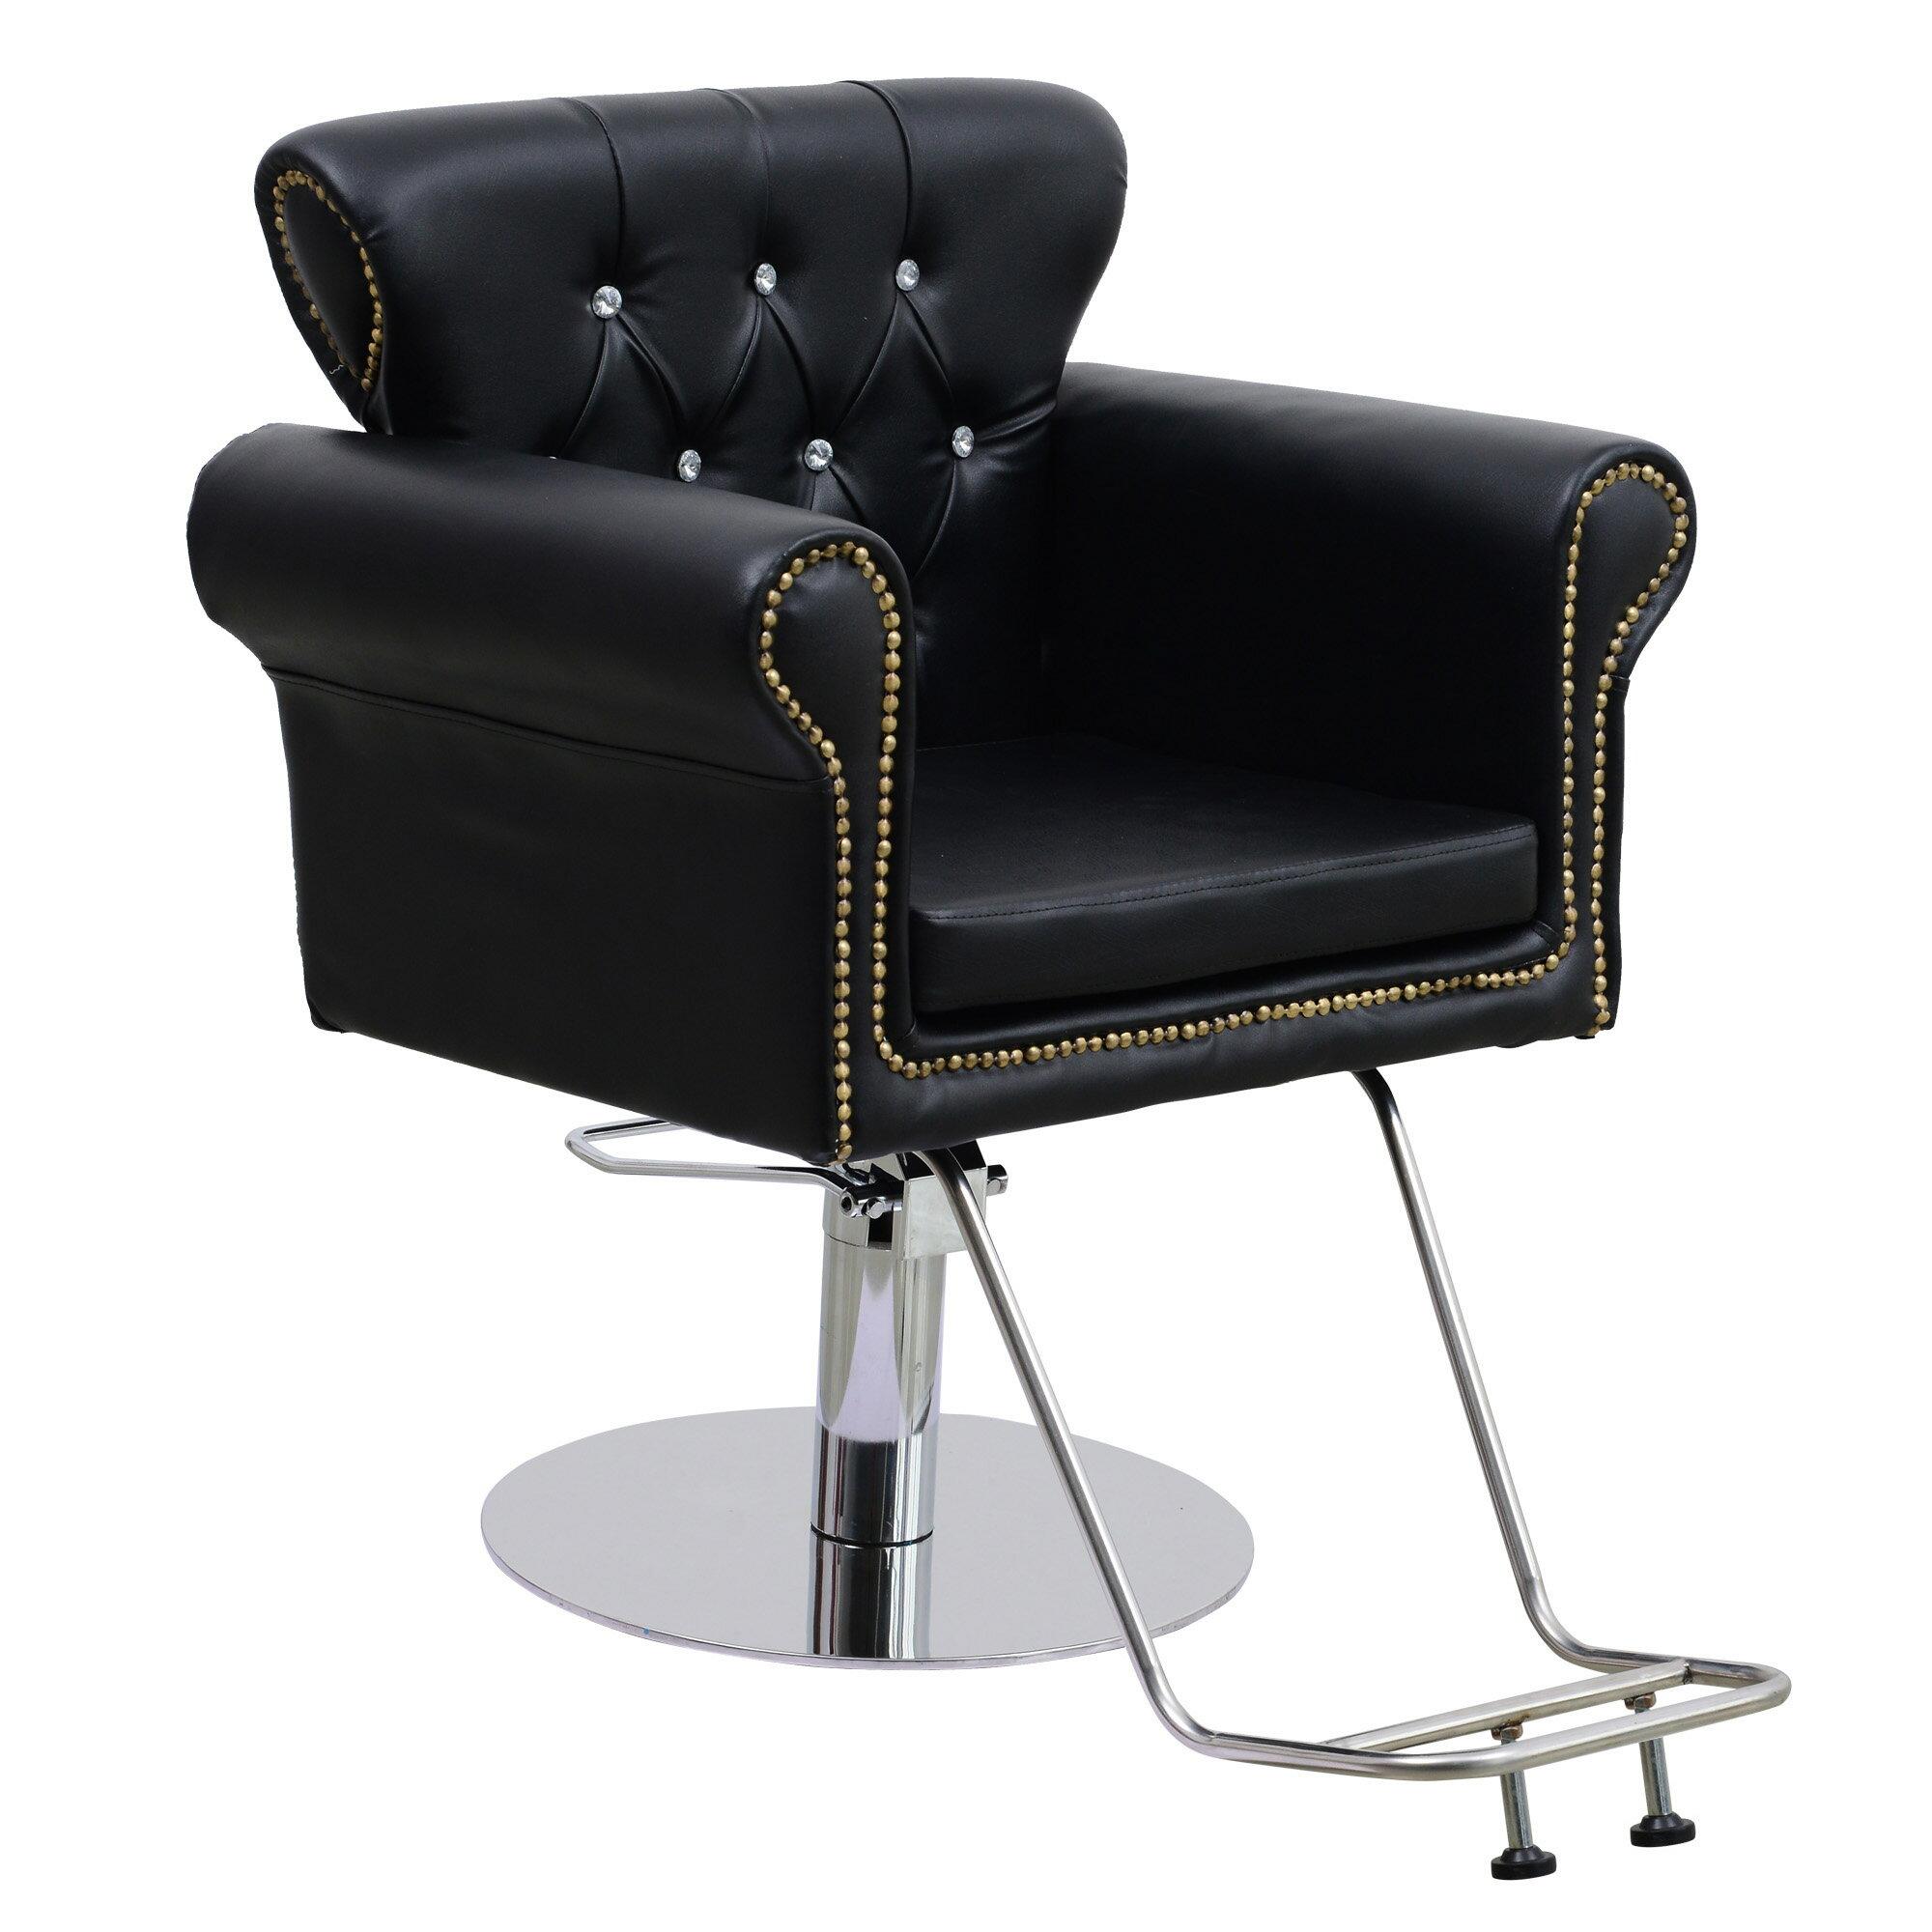 BarberPub Classic Hydraulic Barber Chair Styling Salon Beauty Equipment 8899